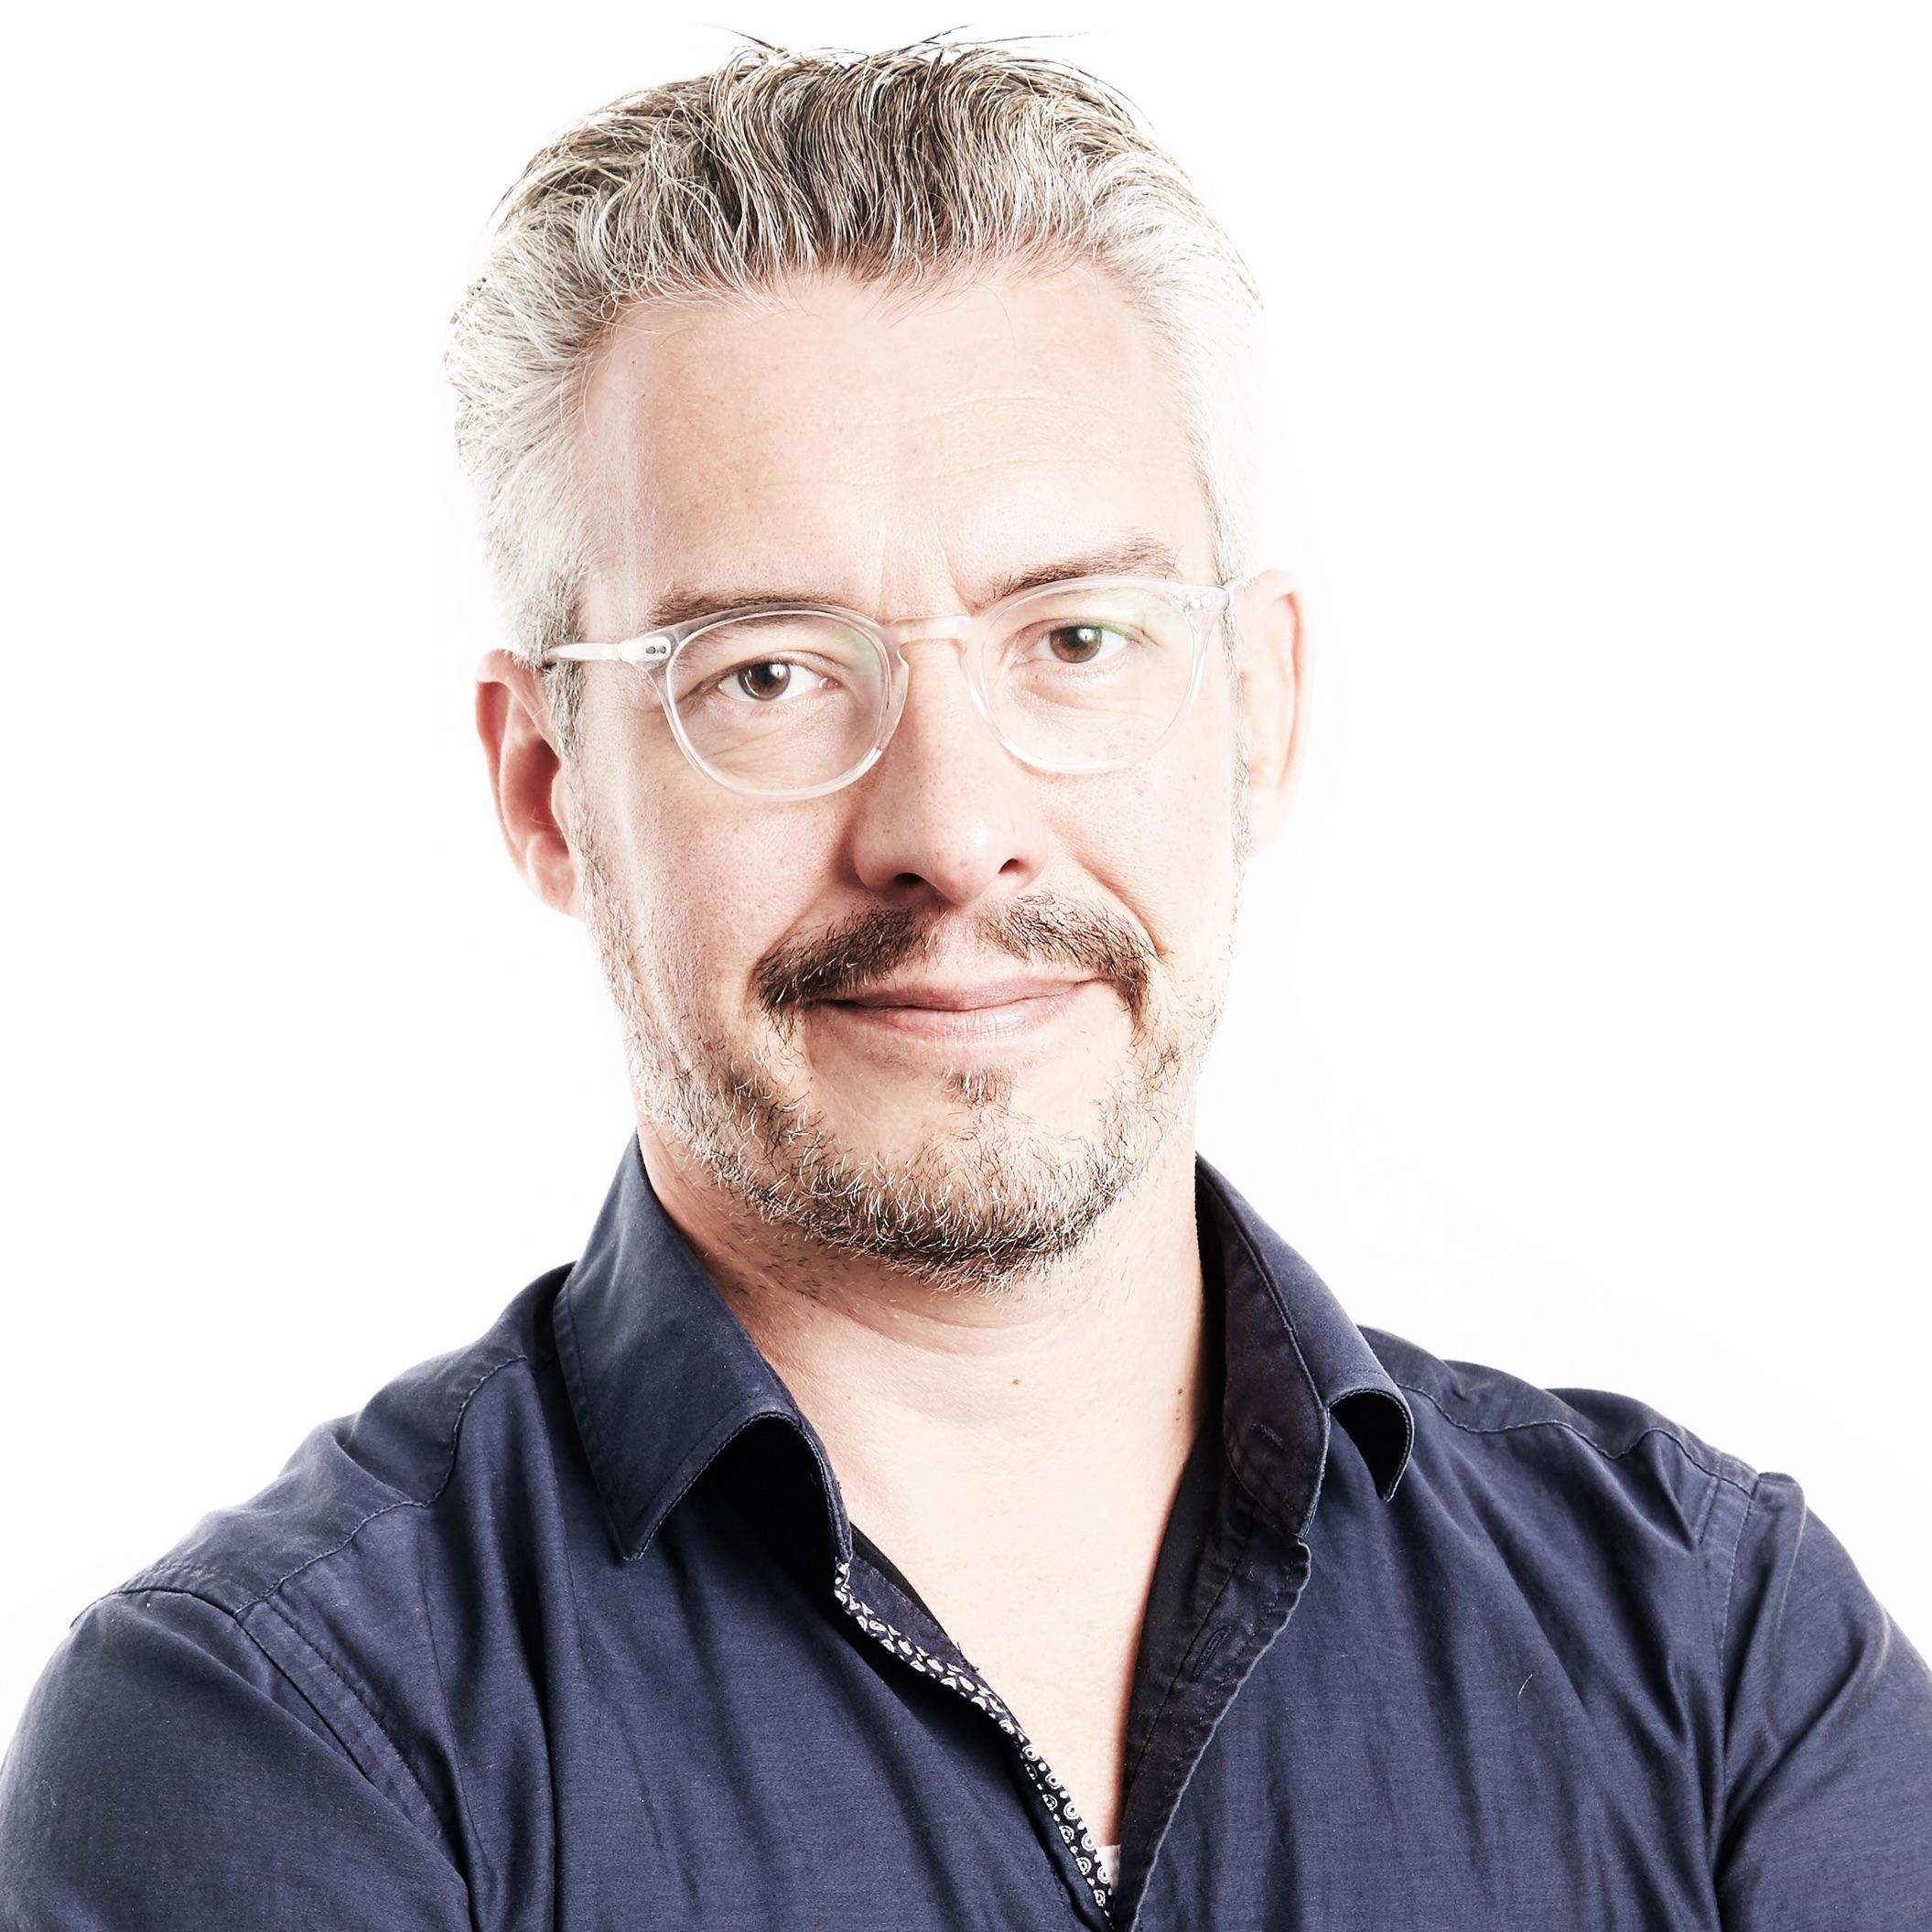 Jacob Møllemose